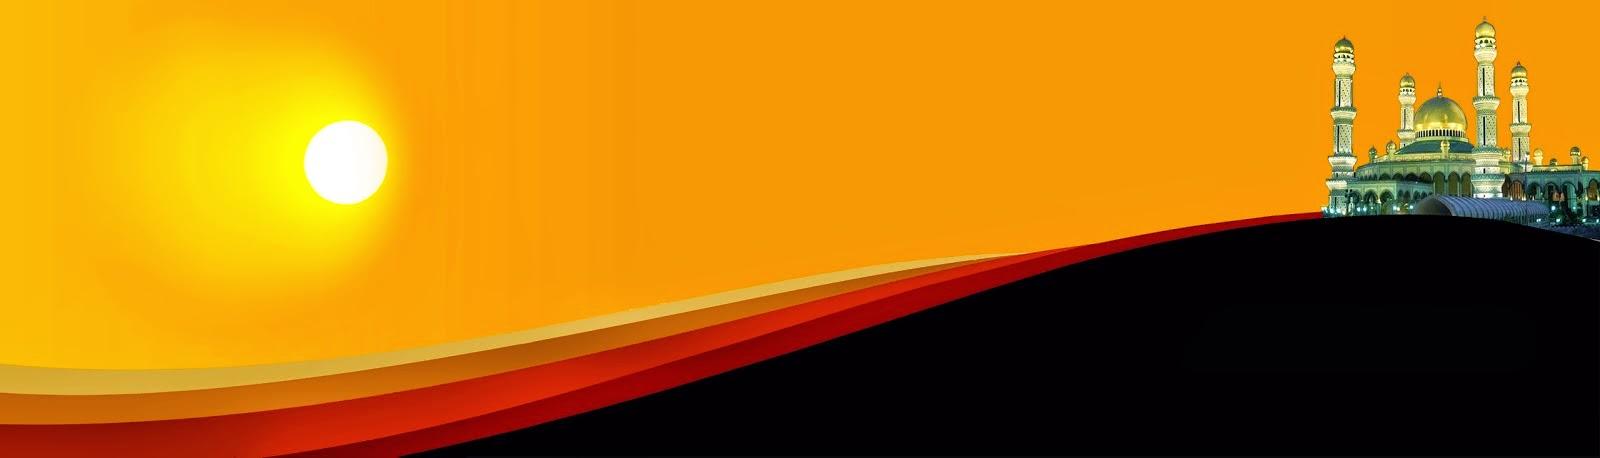 Kumpulan Desain Spanduk Terkeren - Background - ADMIN MADRASAH